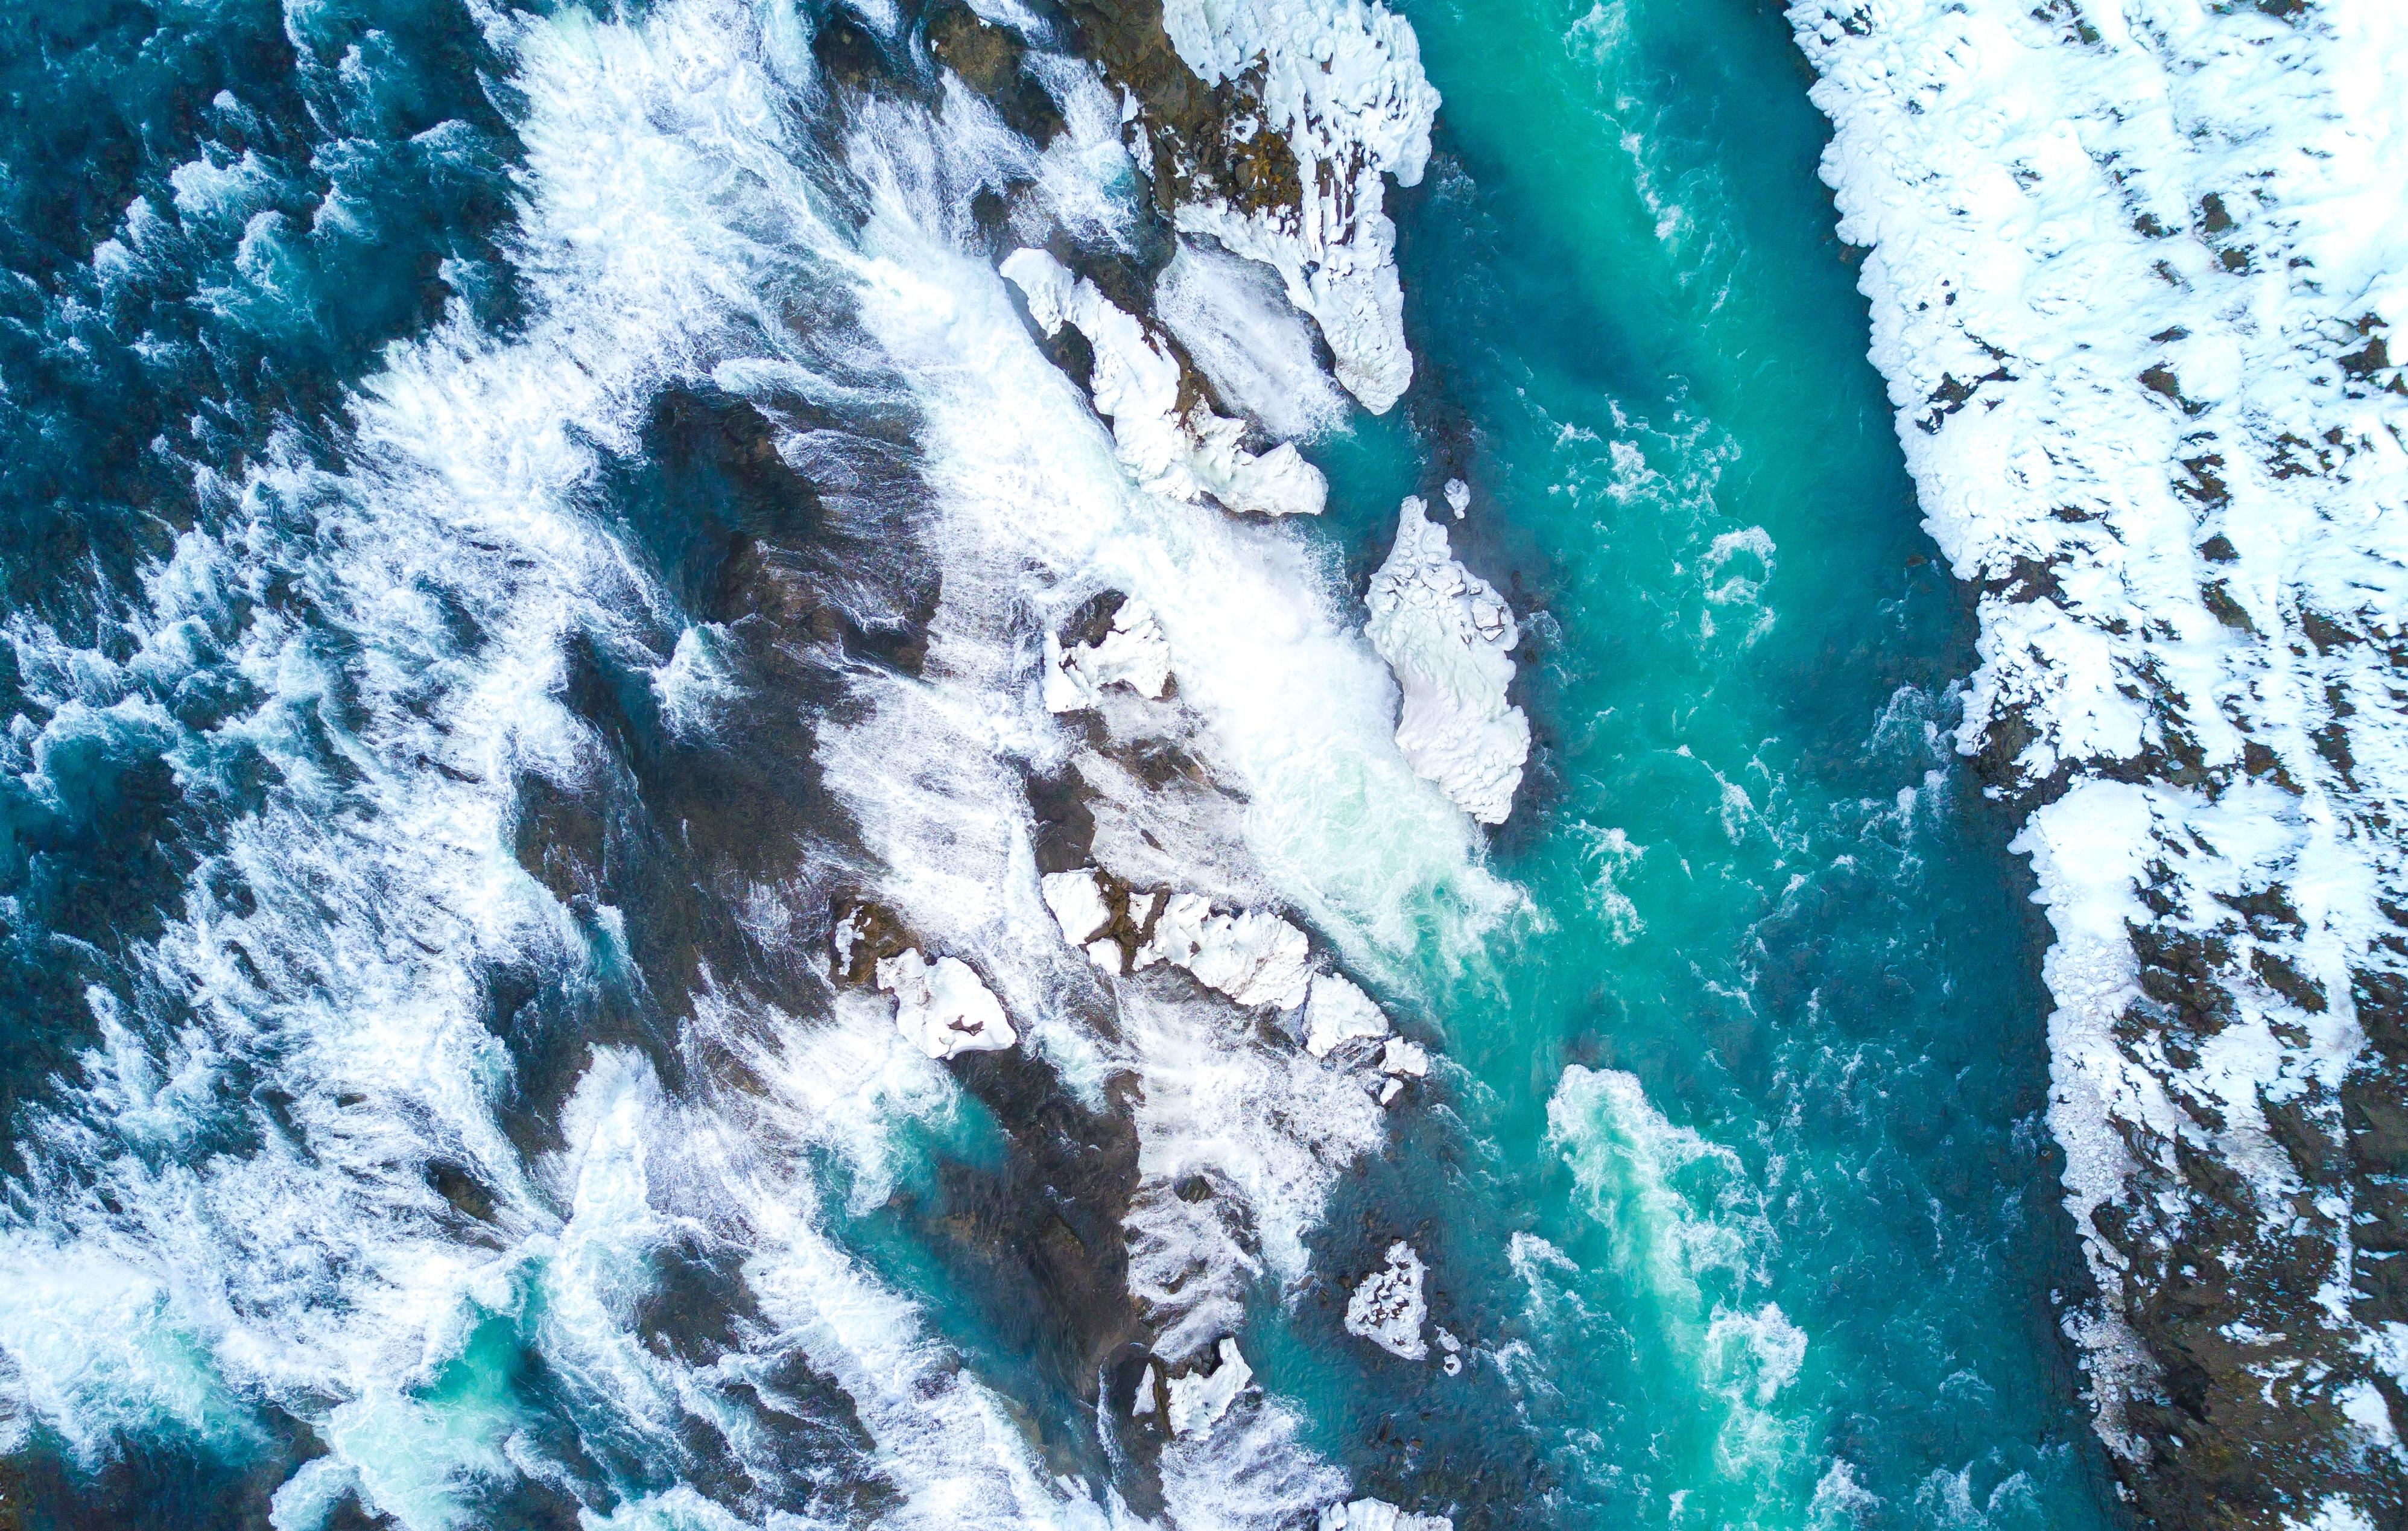 5411200 3992x2538 coast rock wallpaper iceland water 3992x2538